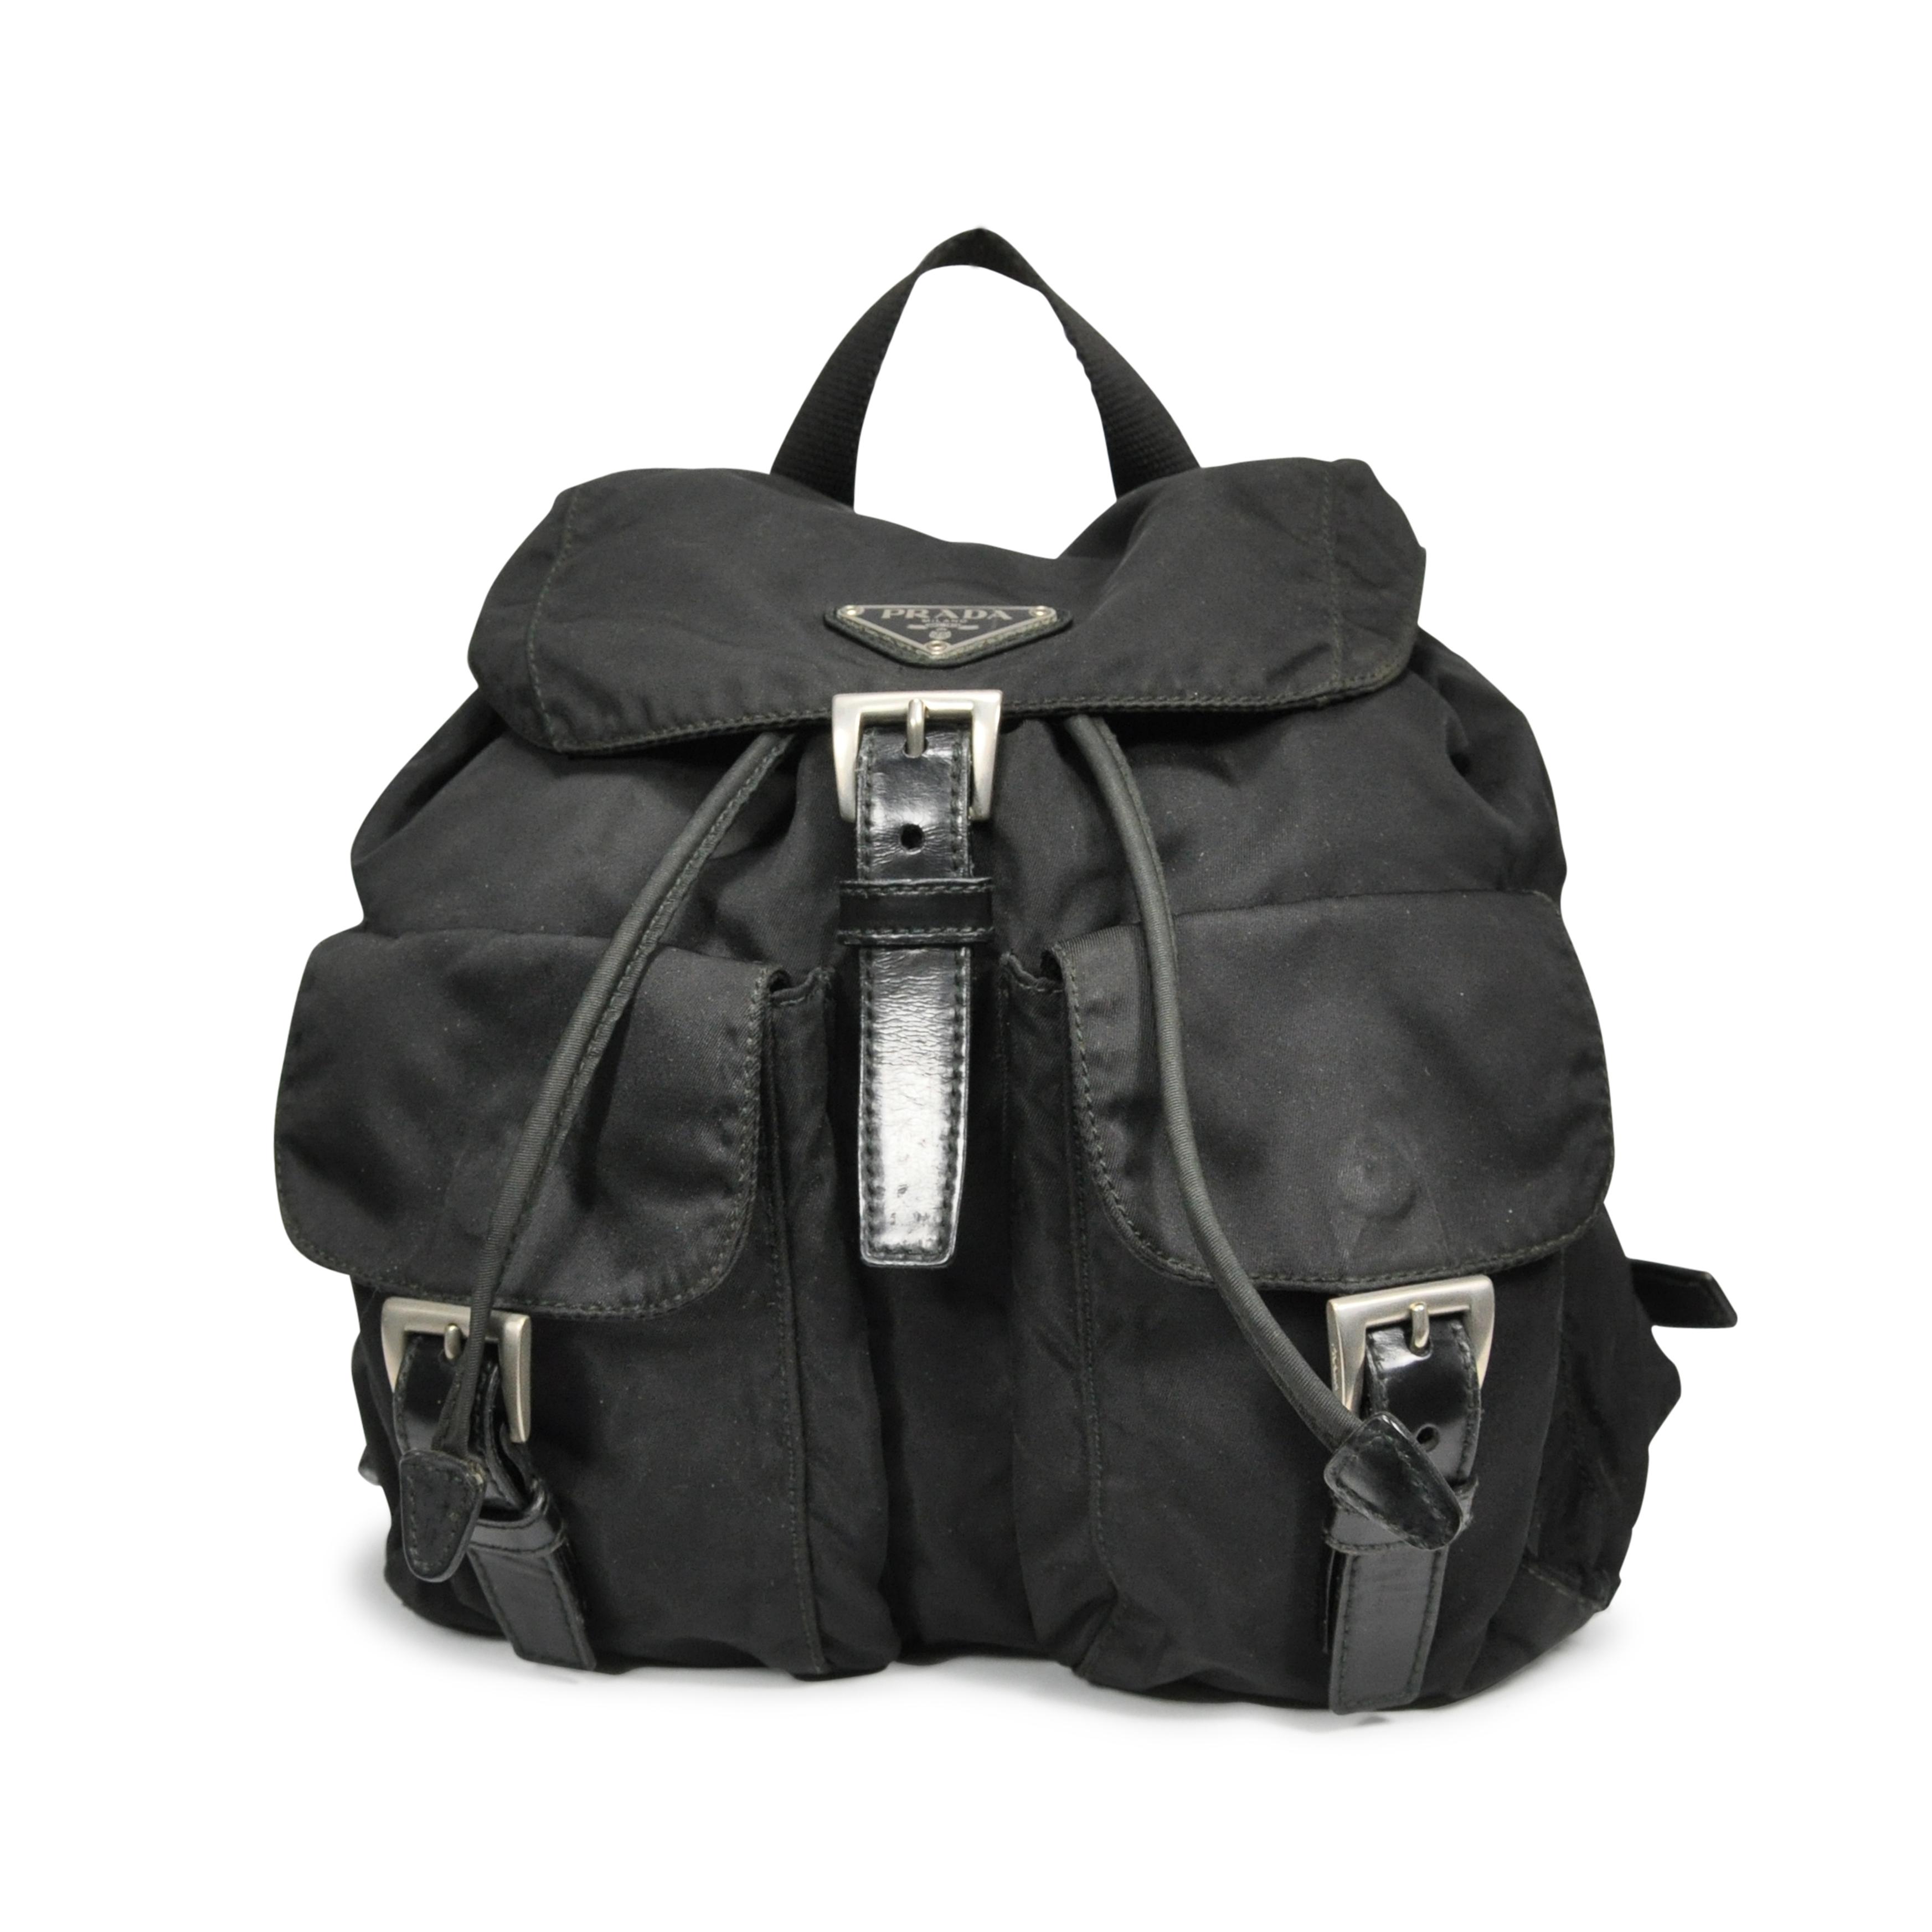 c244e5bbf45c Authentic Second Hand Prada Nylon Backpack (PSS-229-00001)